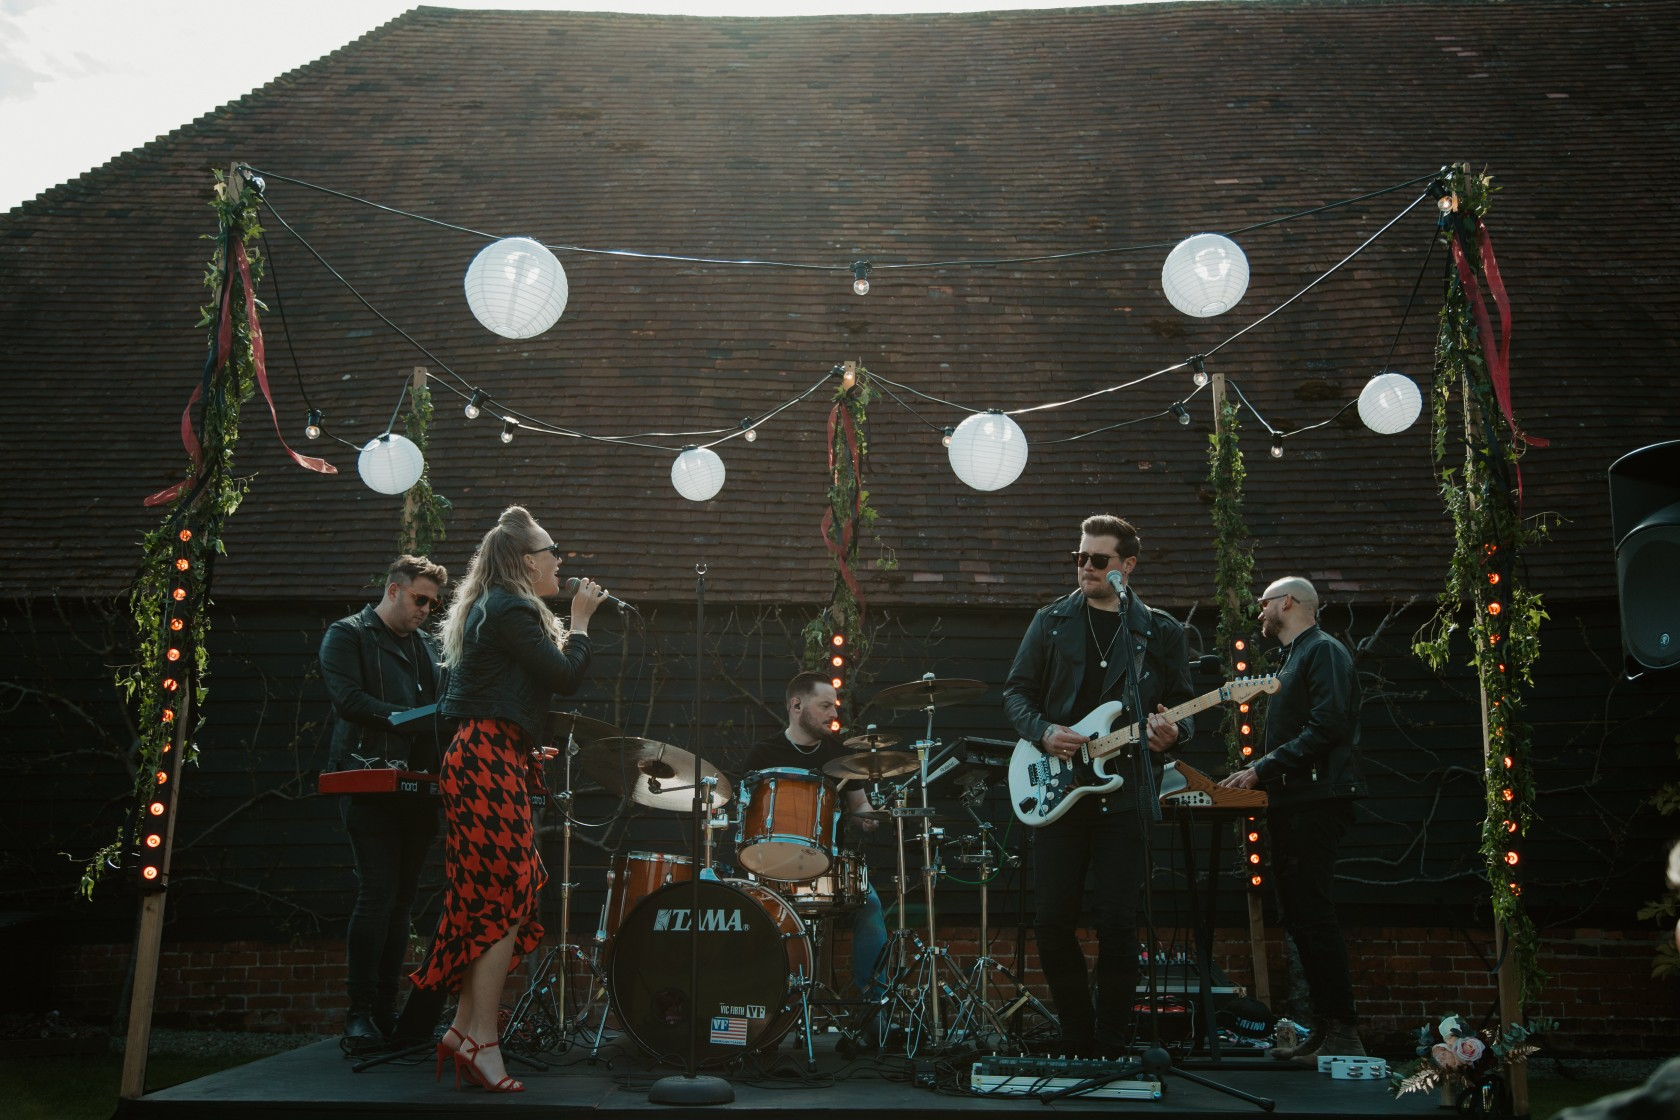 rock and roll wedding - fnkhaus wedding band - rock wedding band - alternative wedding entertainment